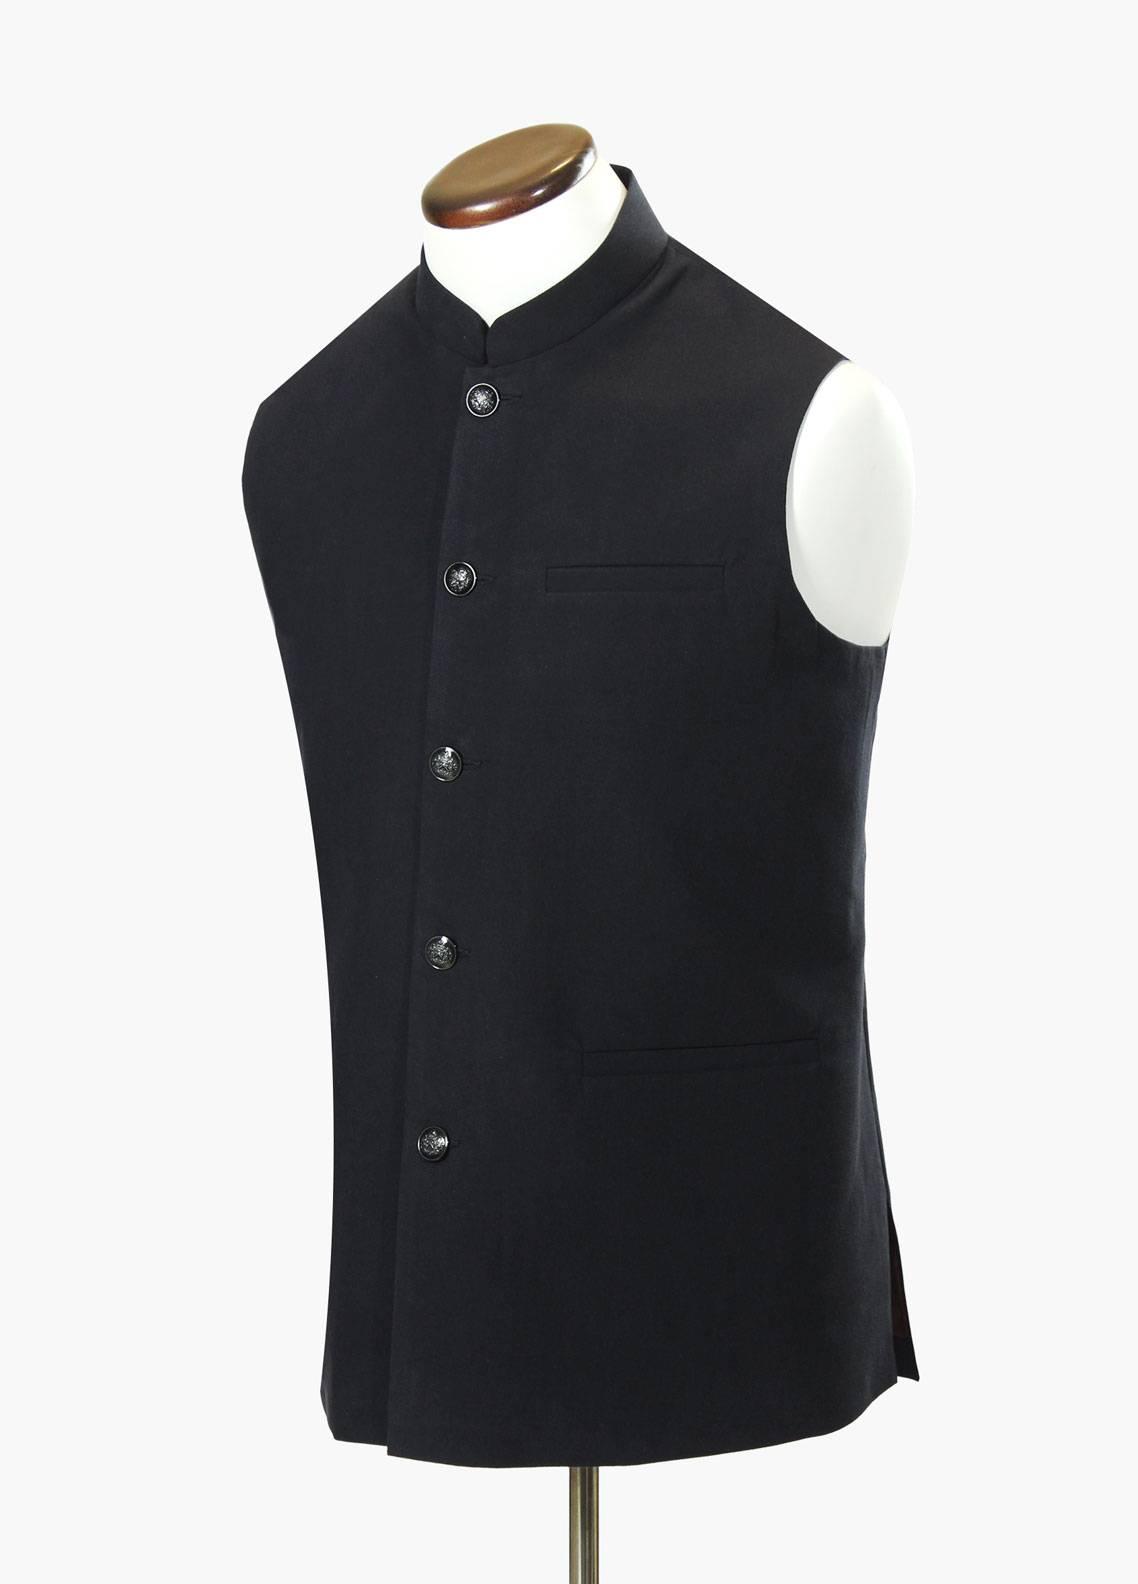 Brumano Cotton Formal Waistcoat for Men - Black BRM-688